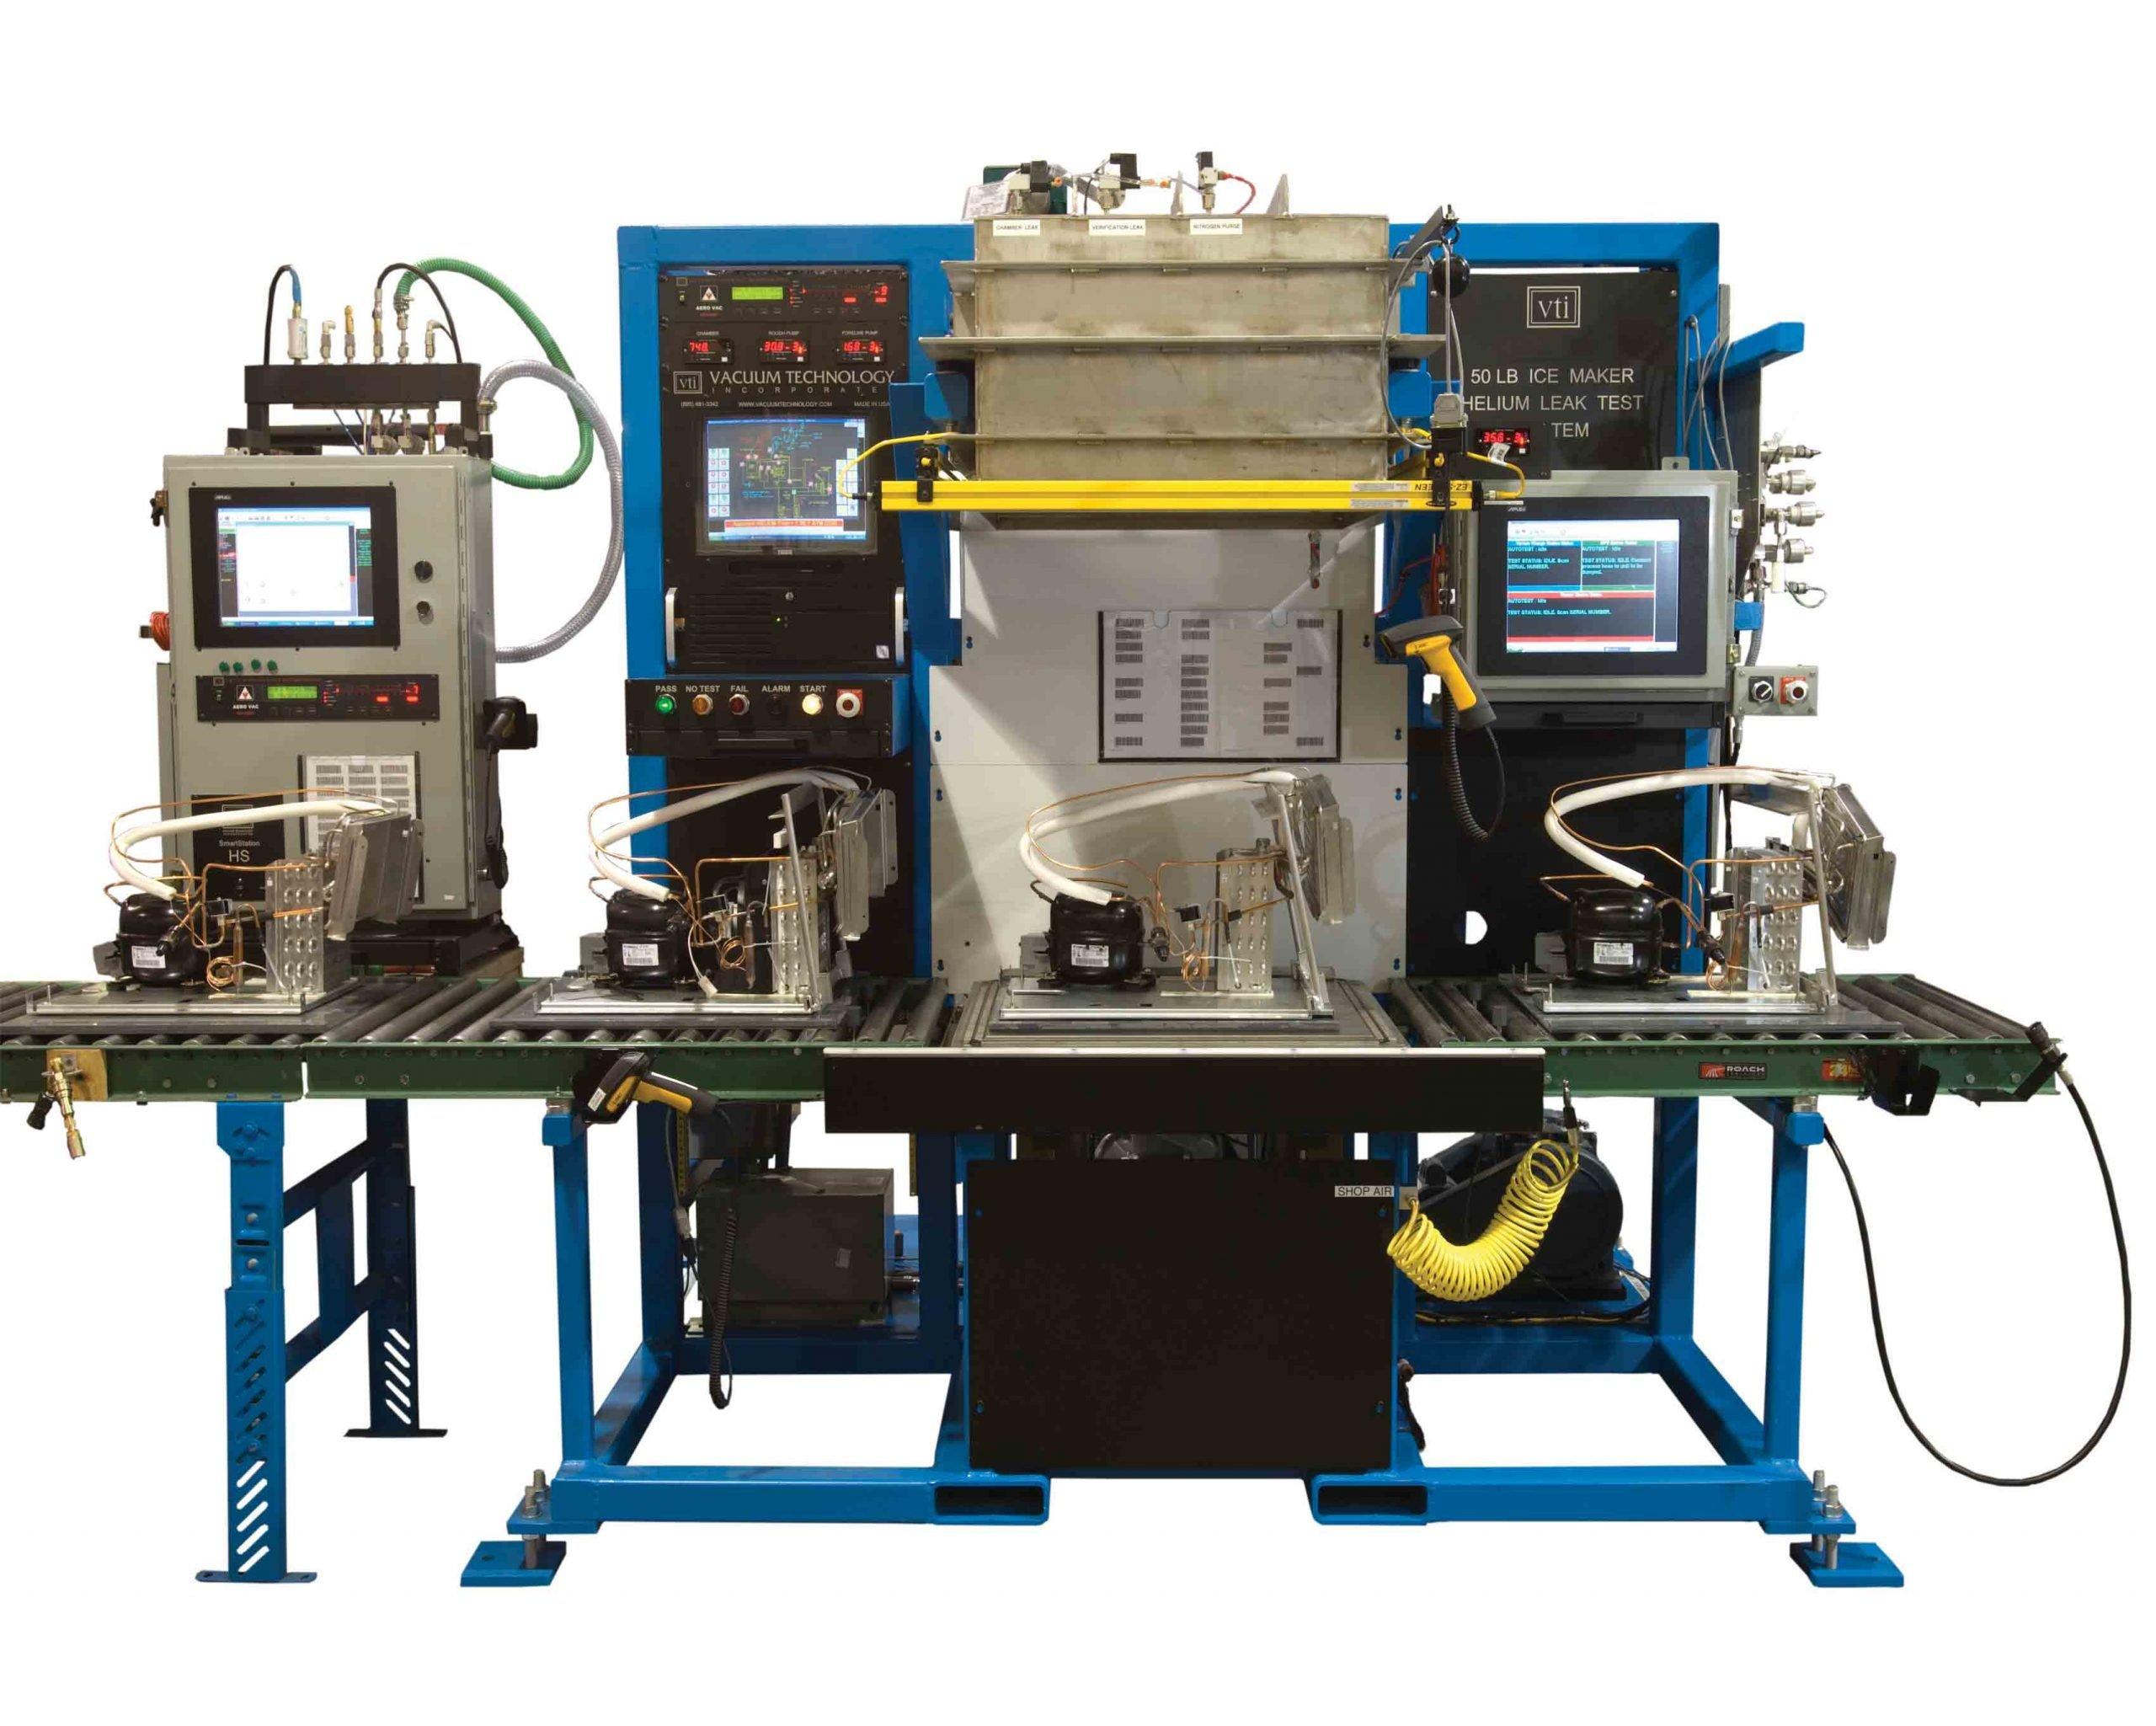 VTI's Under-Counter Sealed Ice Maker Helium Leak Test System for Under-Counter Sealed Ice Maker